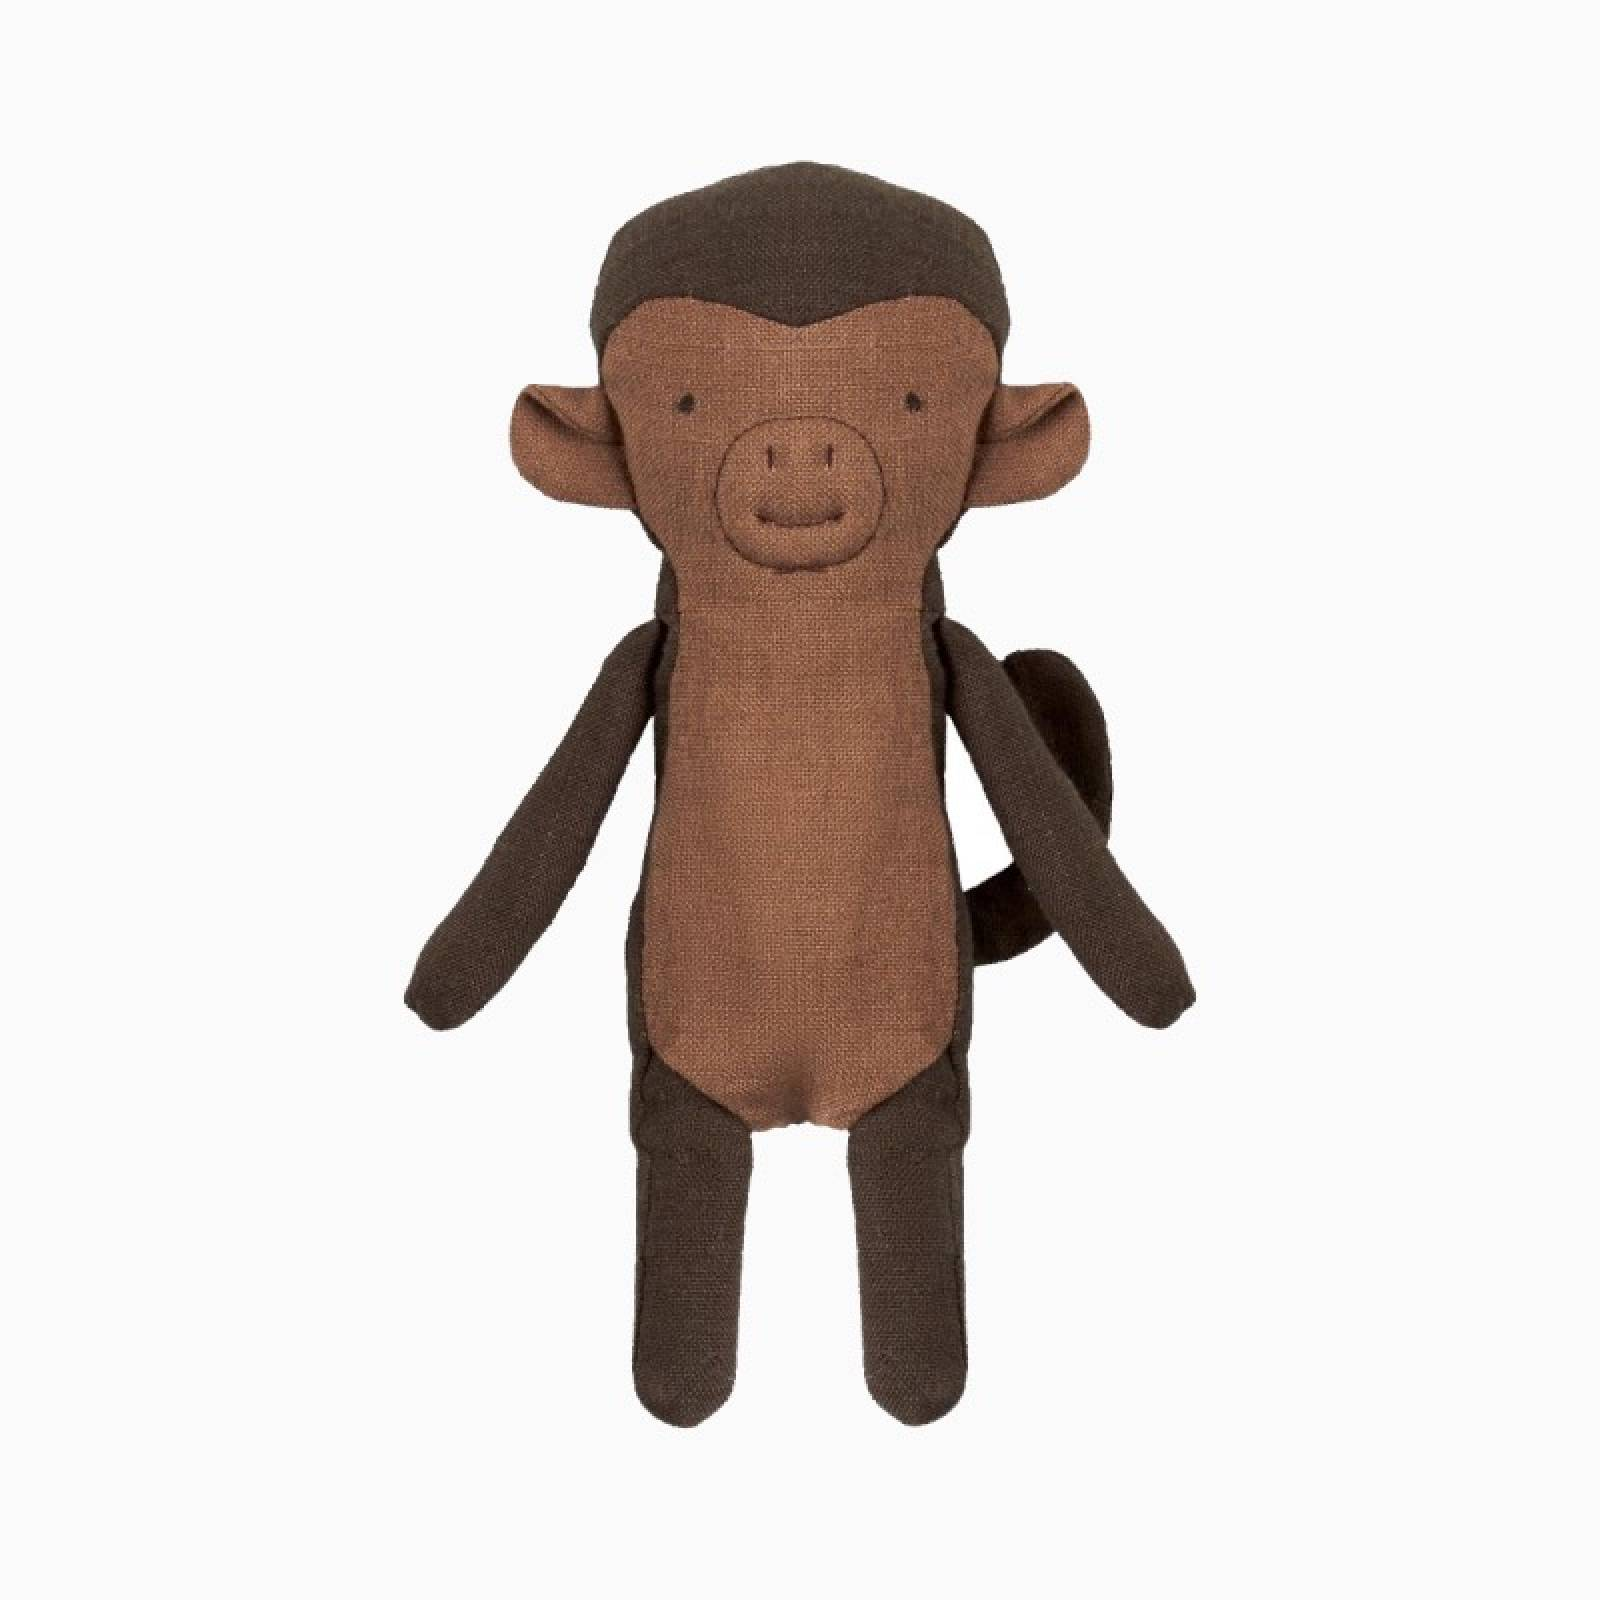 Mini Monkey Soft Toy Noah's Friends By Maileg 0+